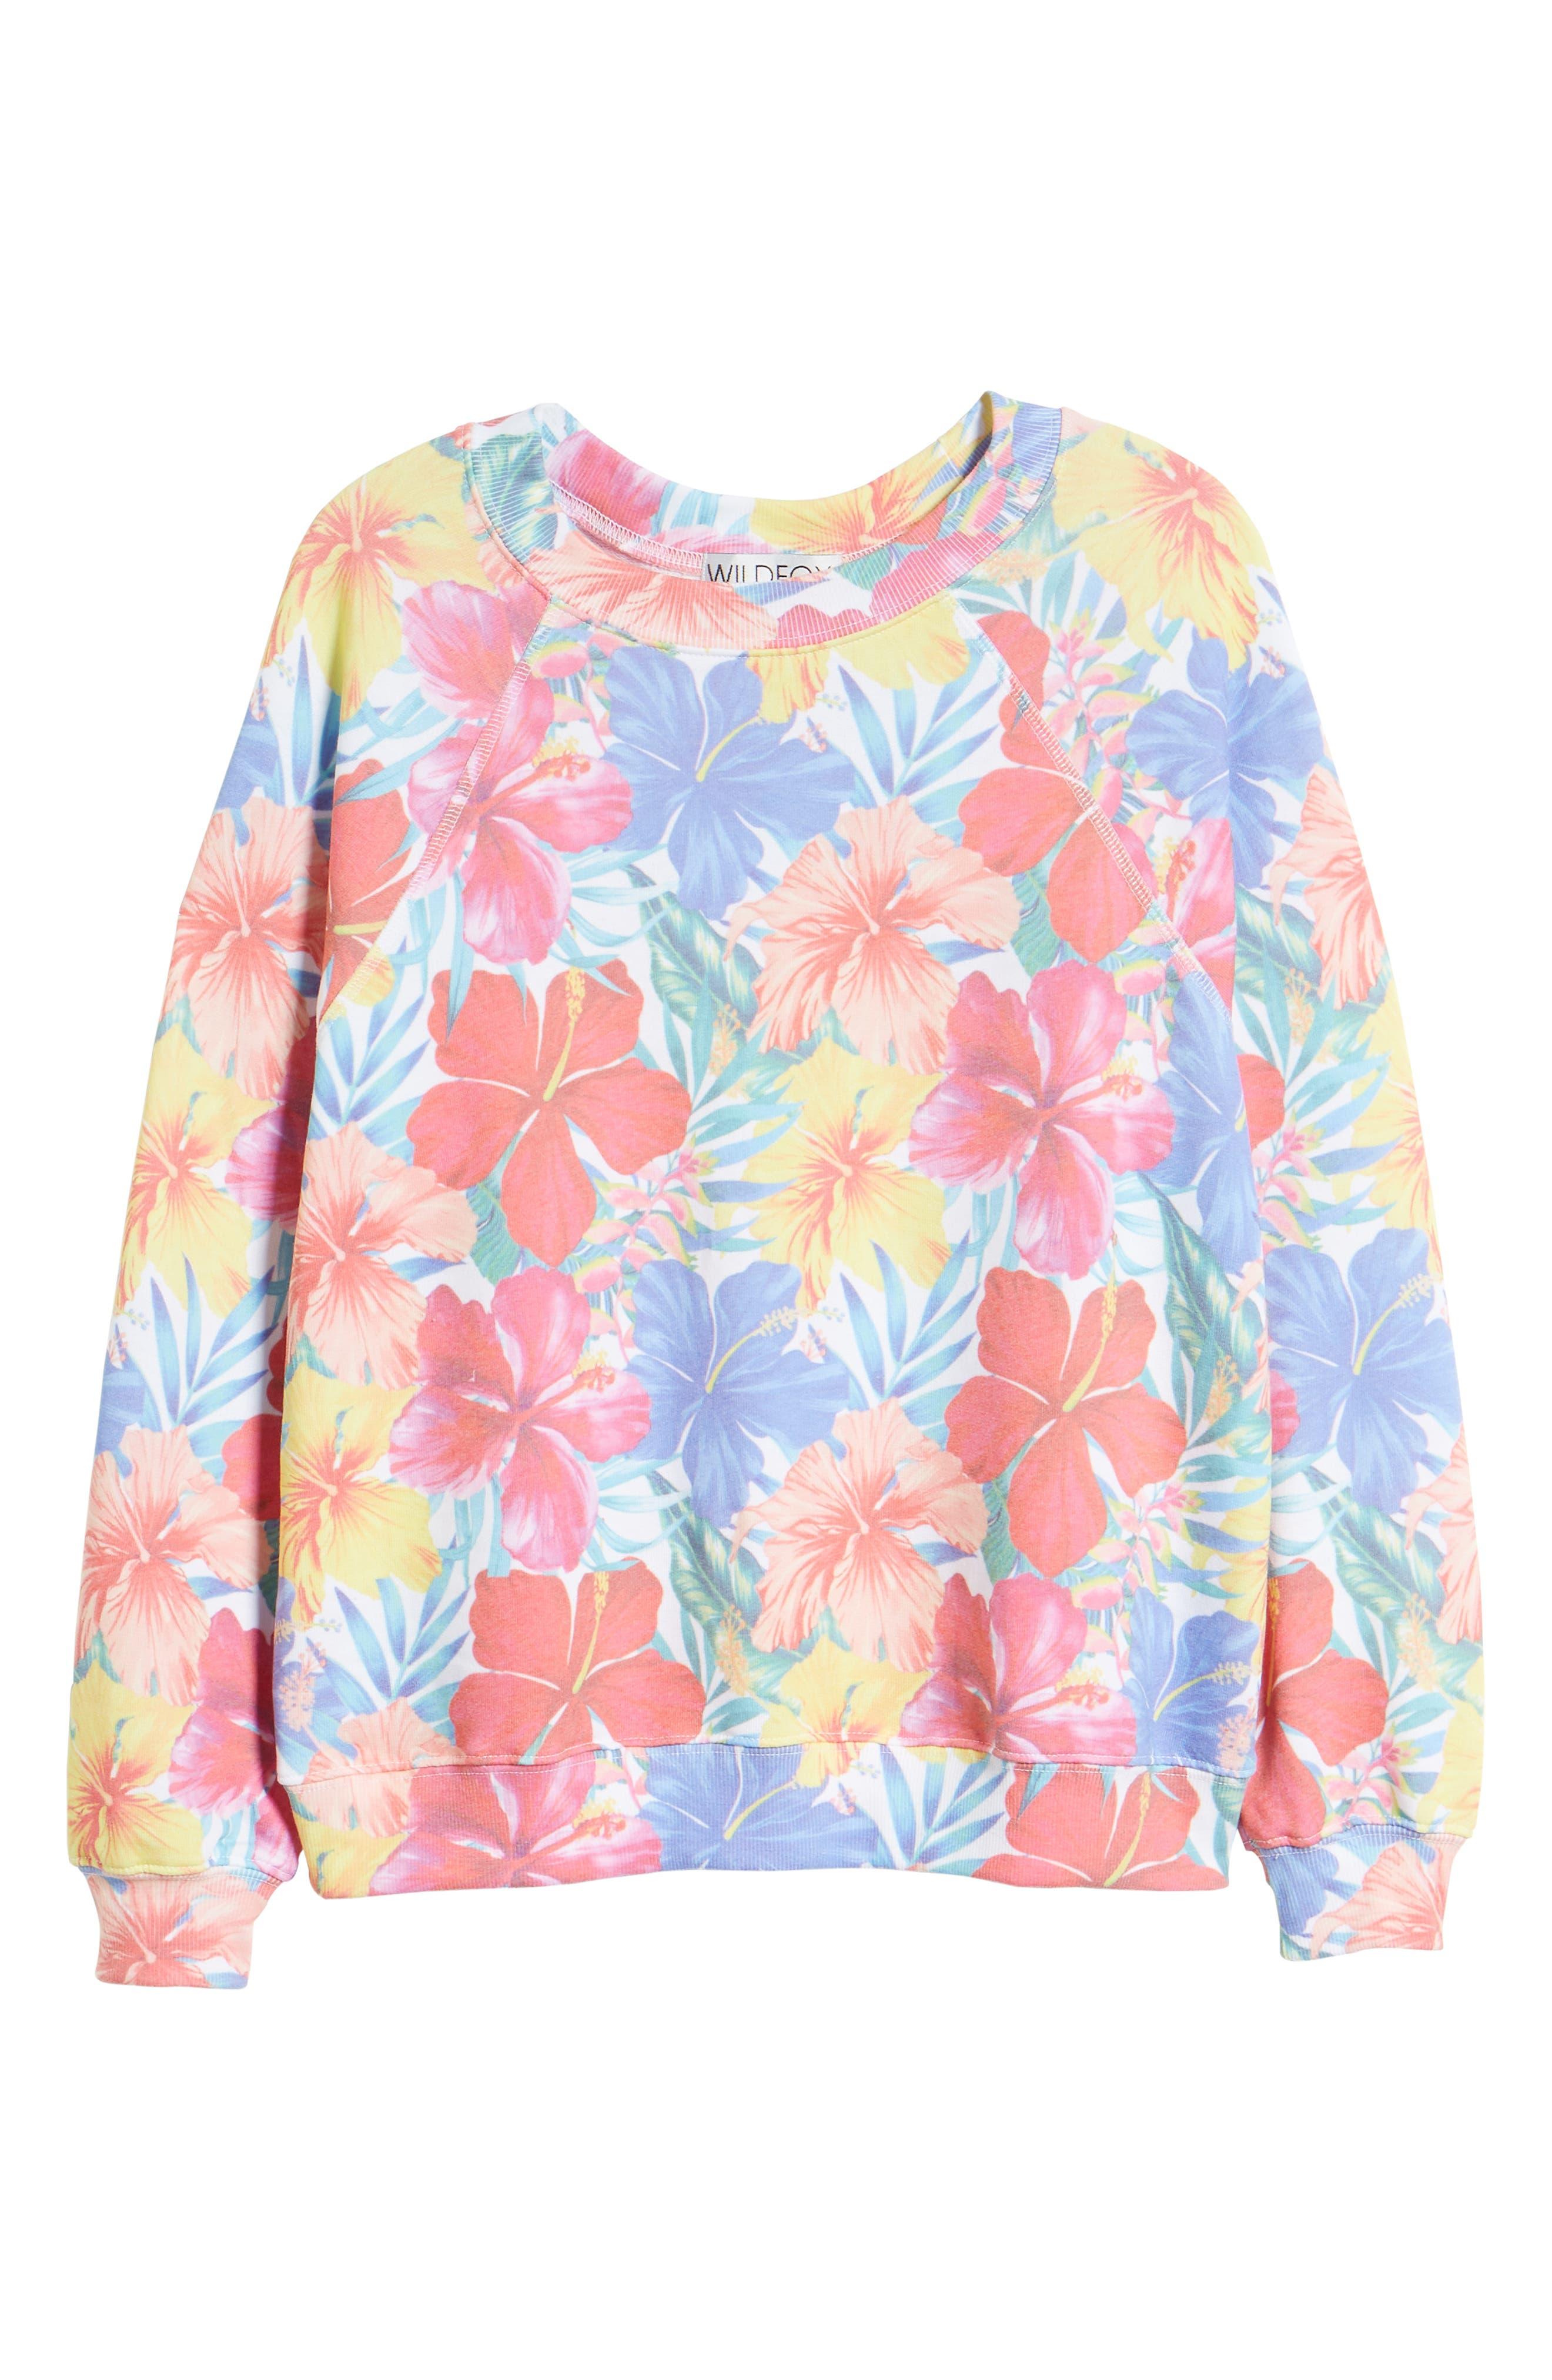 Tropicalia Sommers Sweatshirt,                             Alternate thumbnail 6, color,                             650